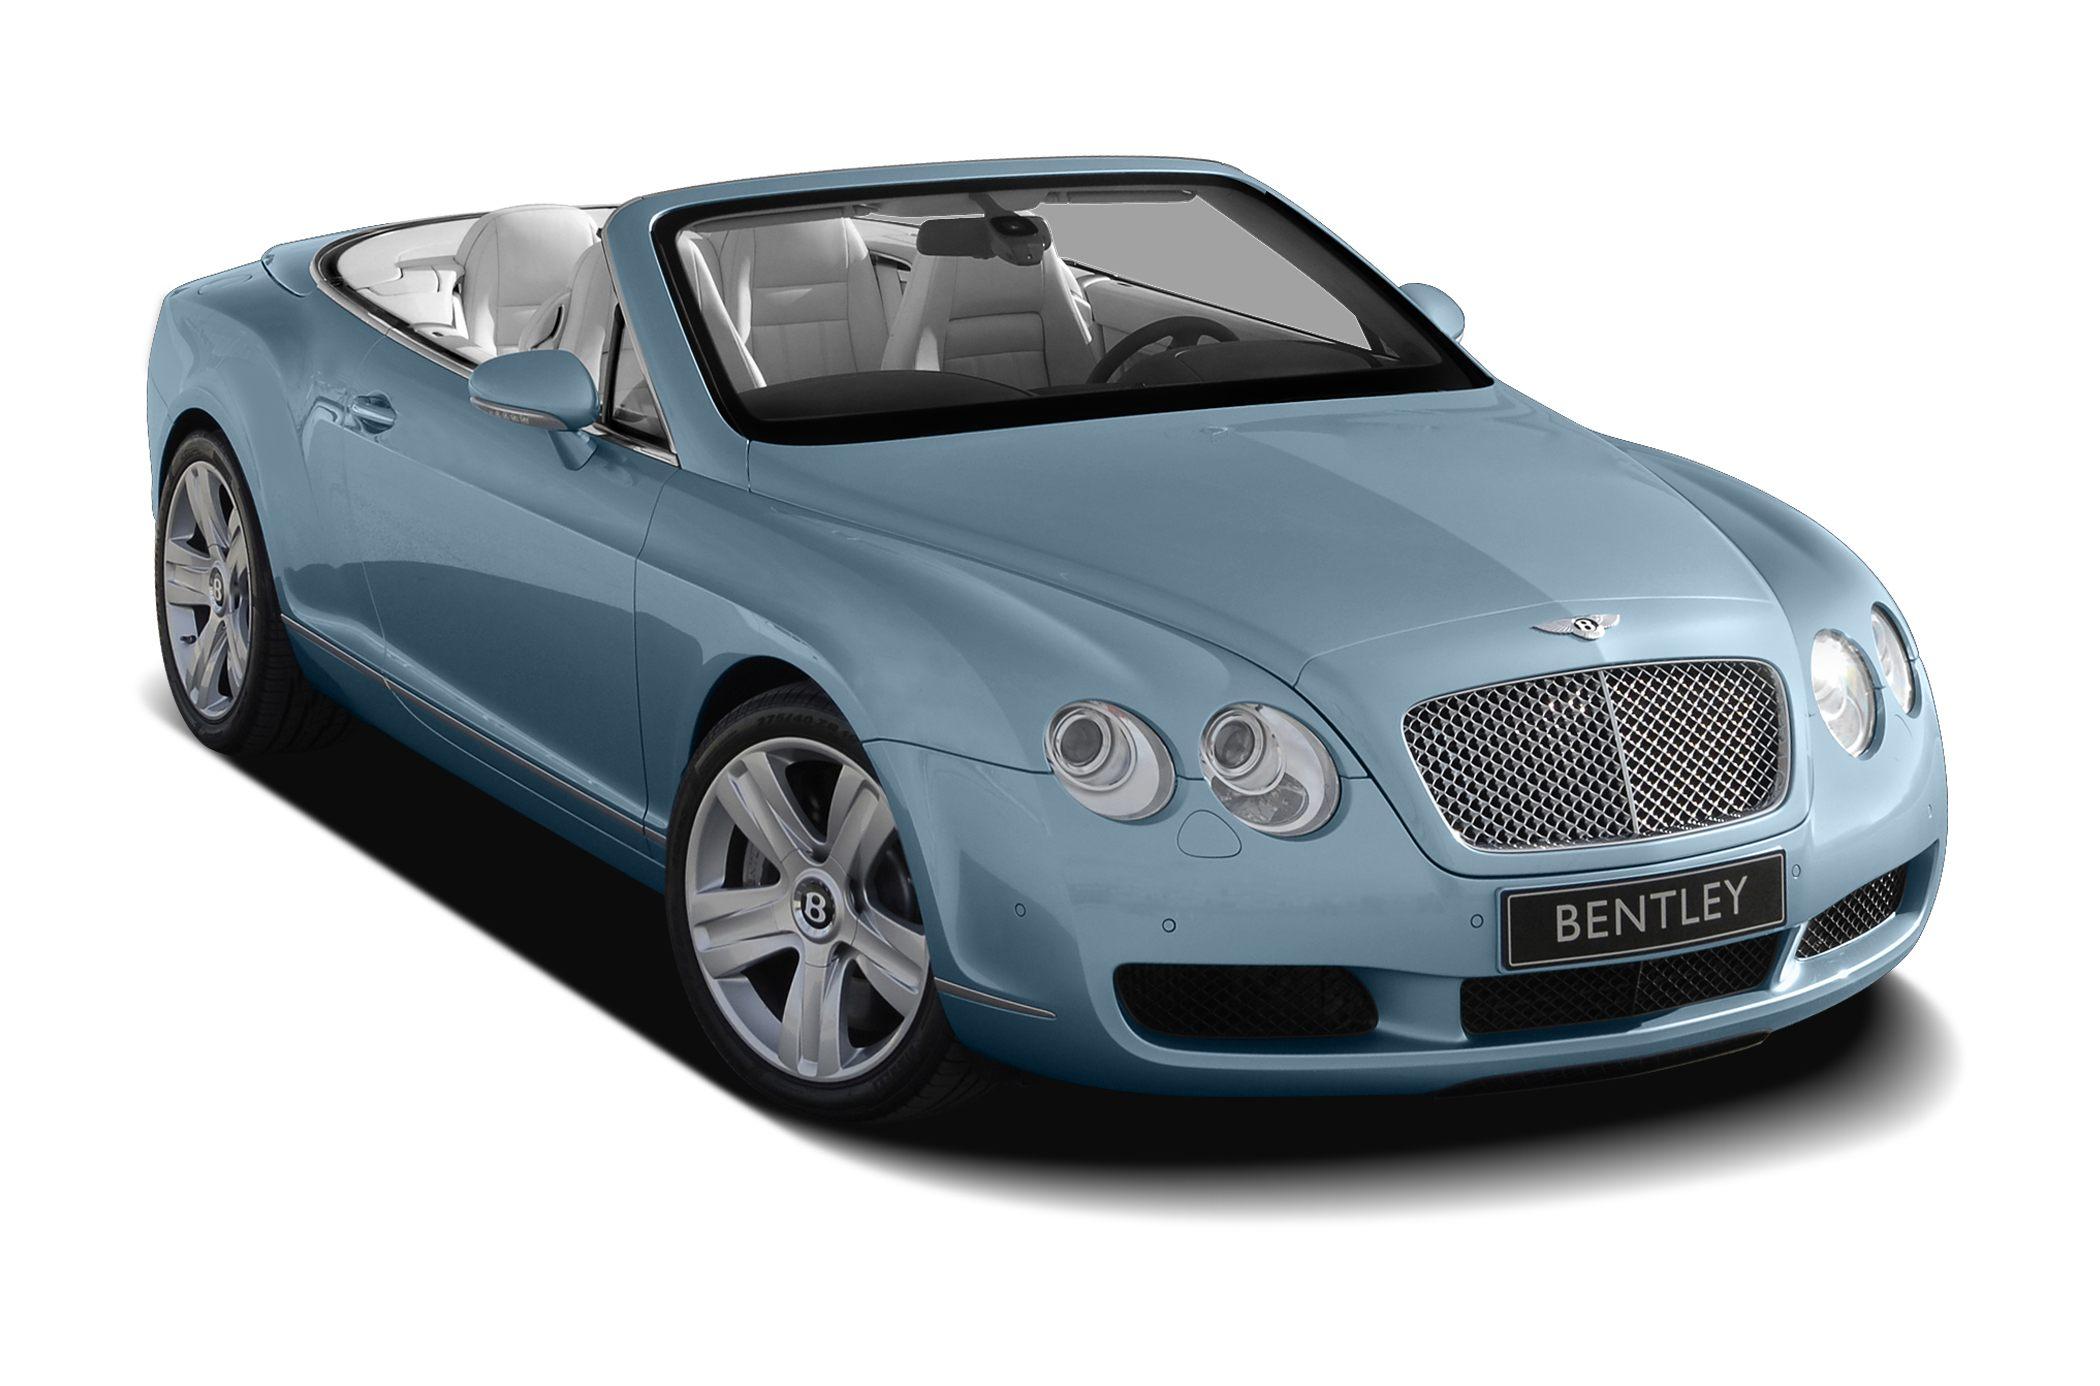 2007 Bentley Continental GTC Base Miles 79700Color Dark Blue Stock 246952388 VIN SCBDR33W07C0